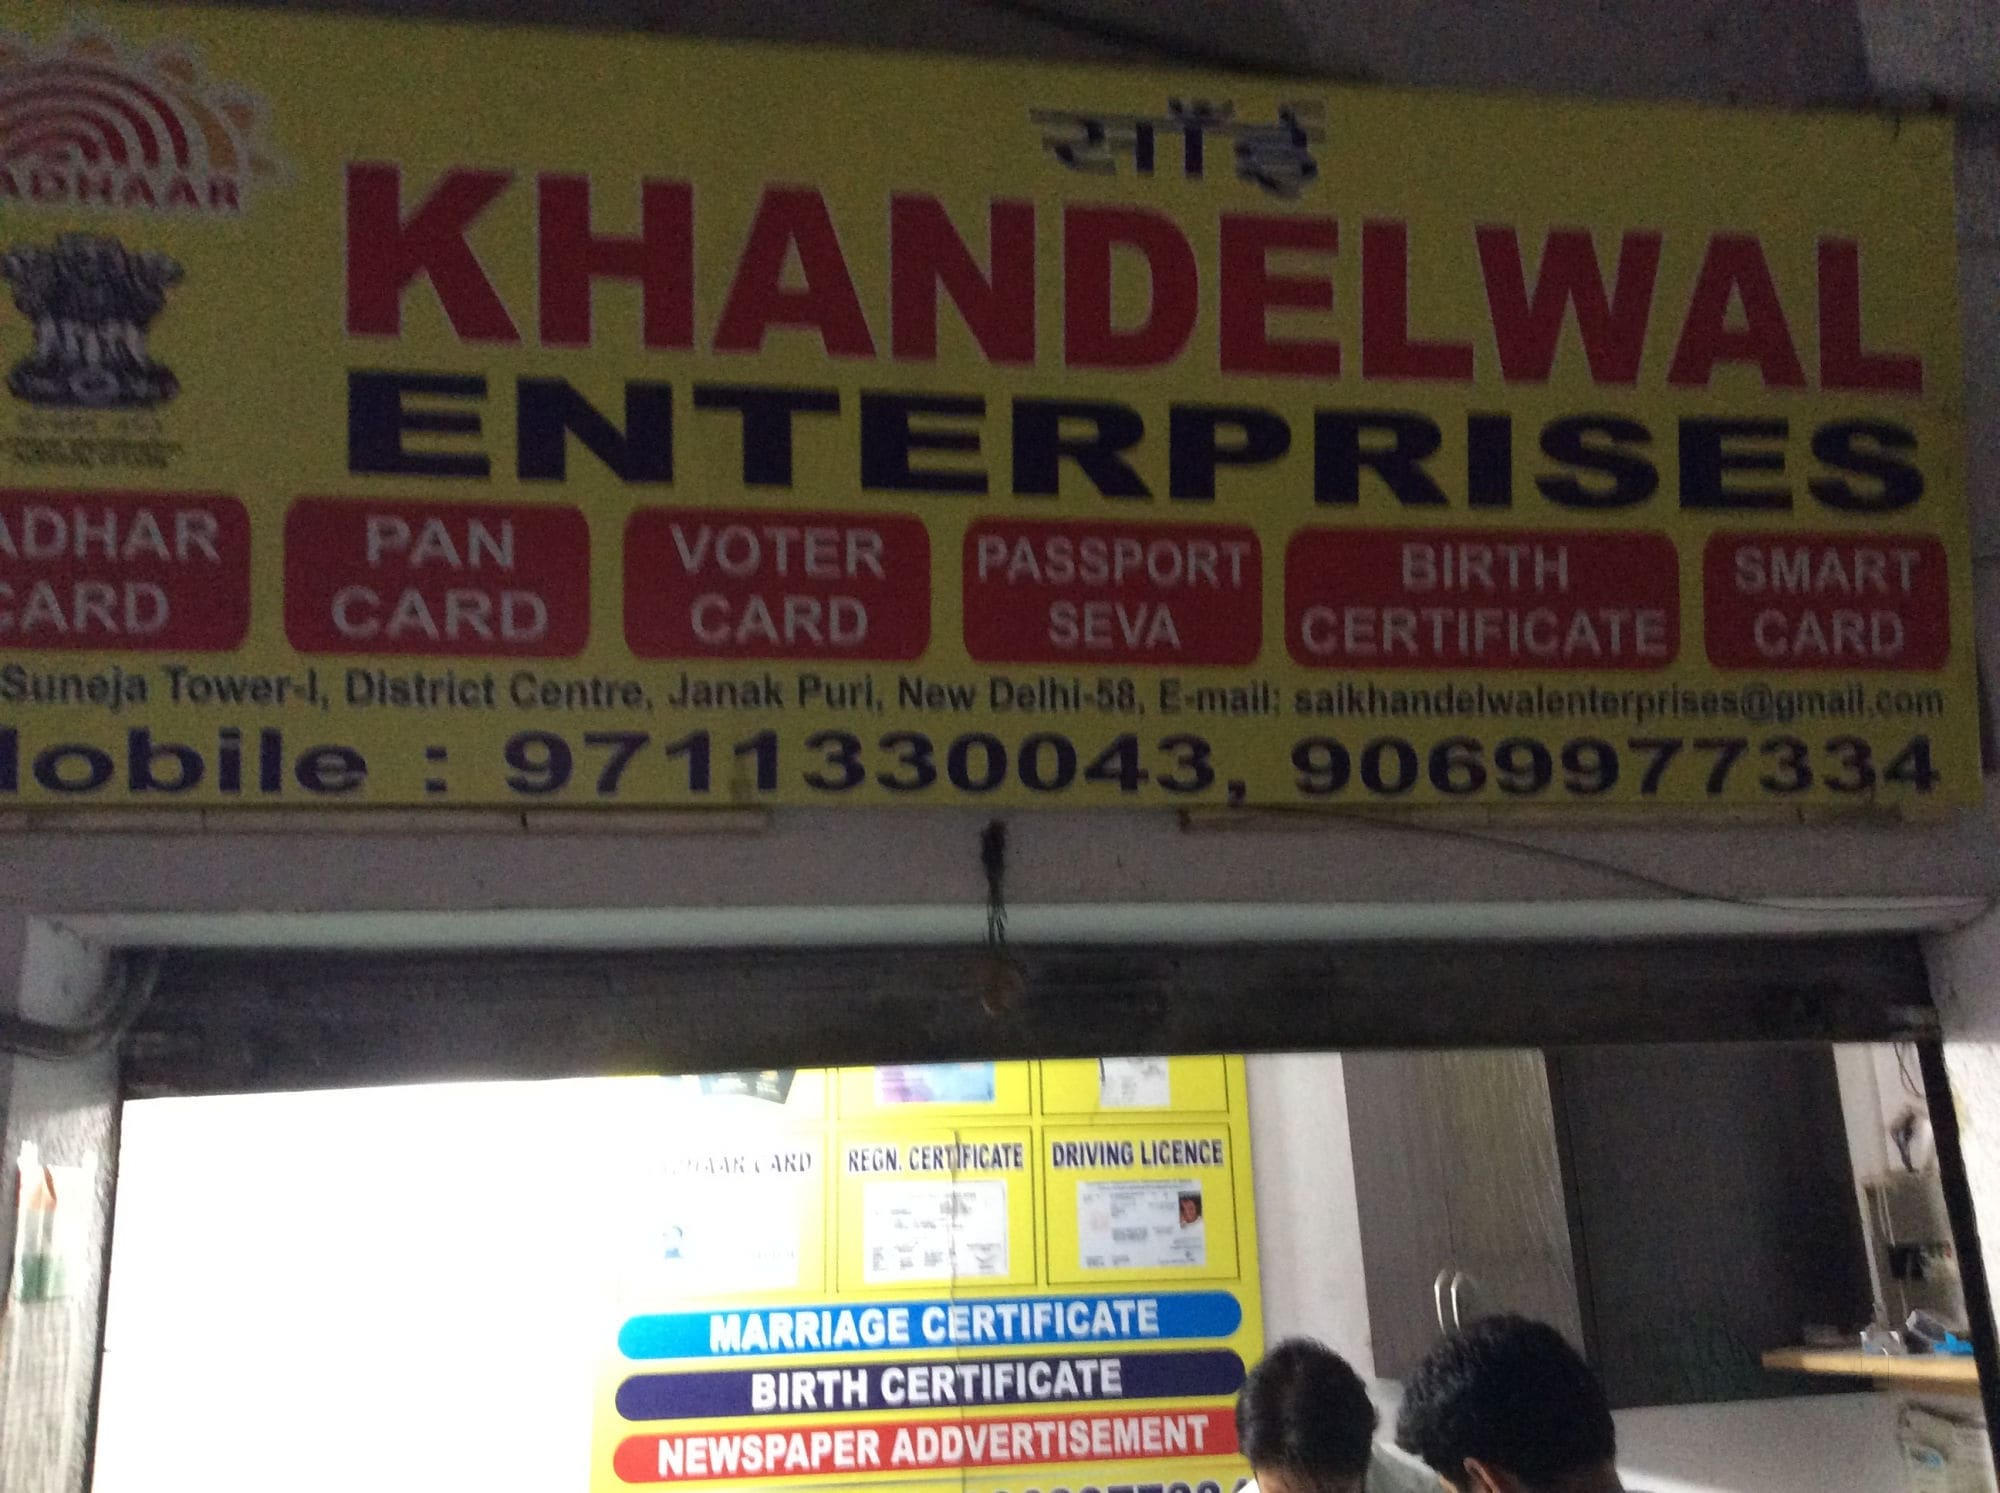 Khandelwal enterprises janakpuri district centre aadhaar card khandelwal enterprises janakpuri district centre aadhaar card agents in delhi justdial 1betcityfo Image collections